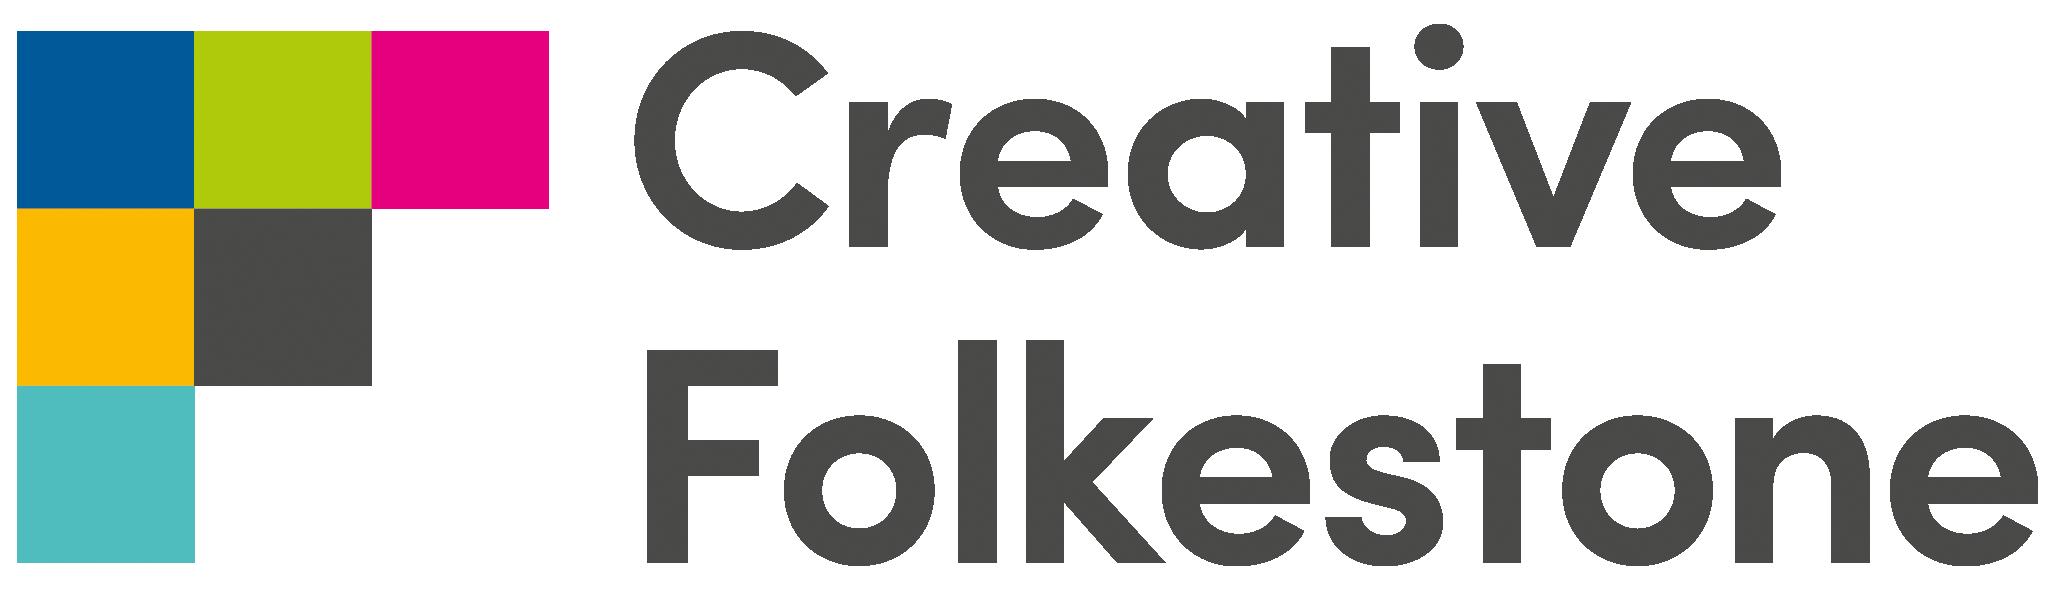 Creative Folkestone logo